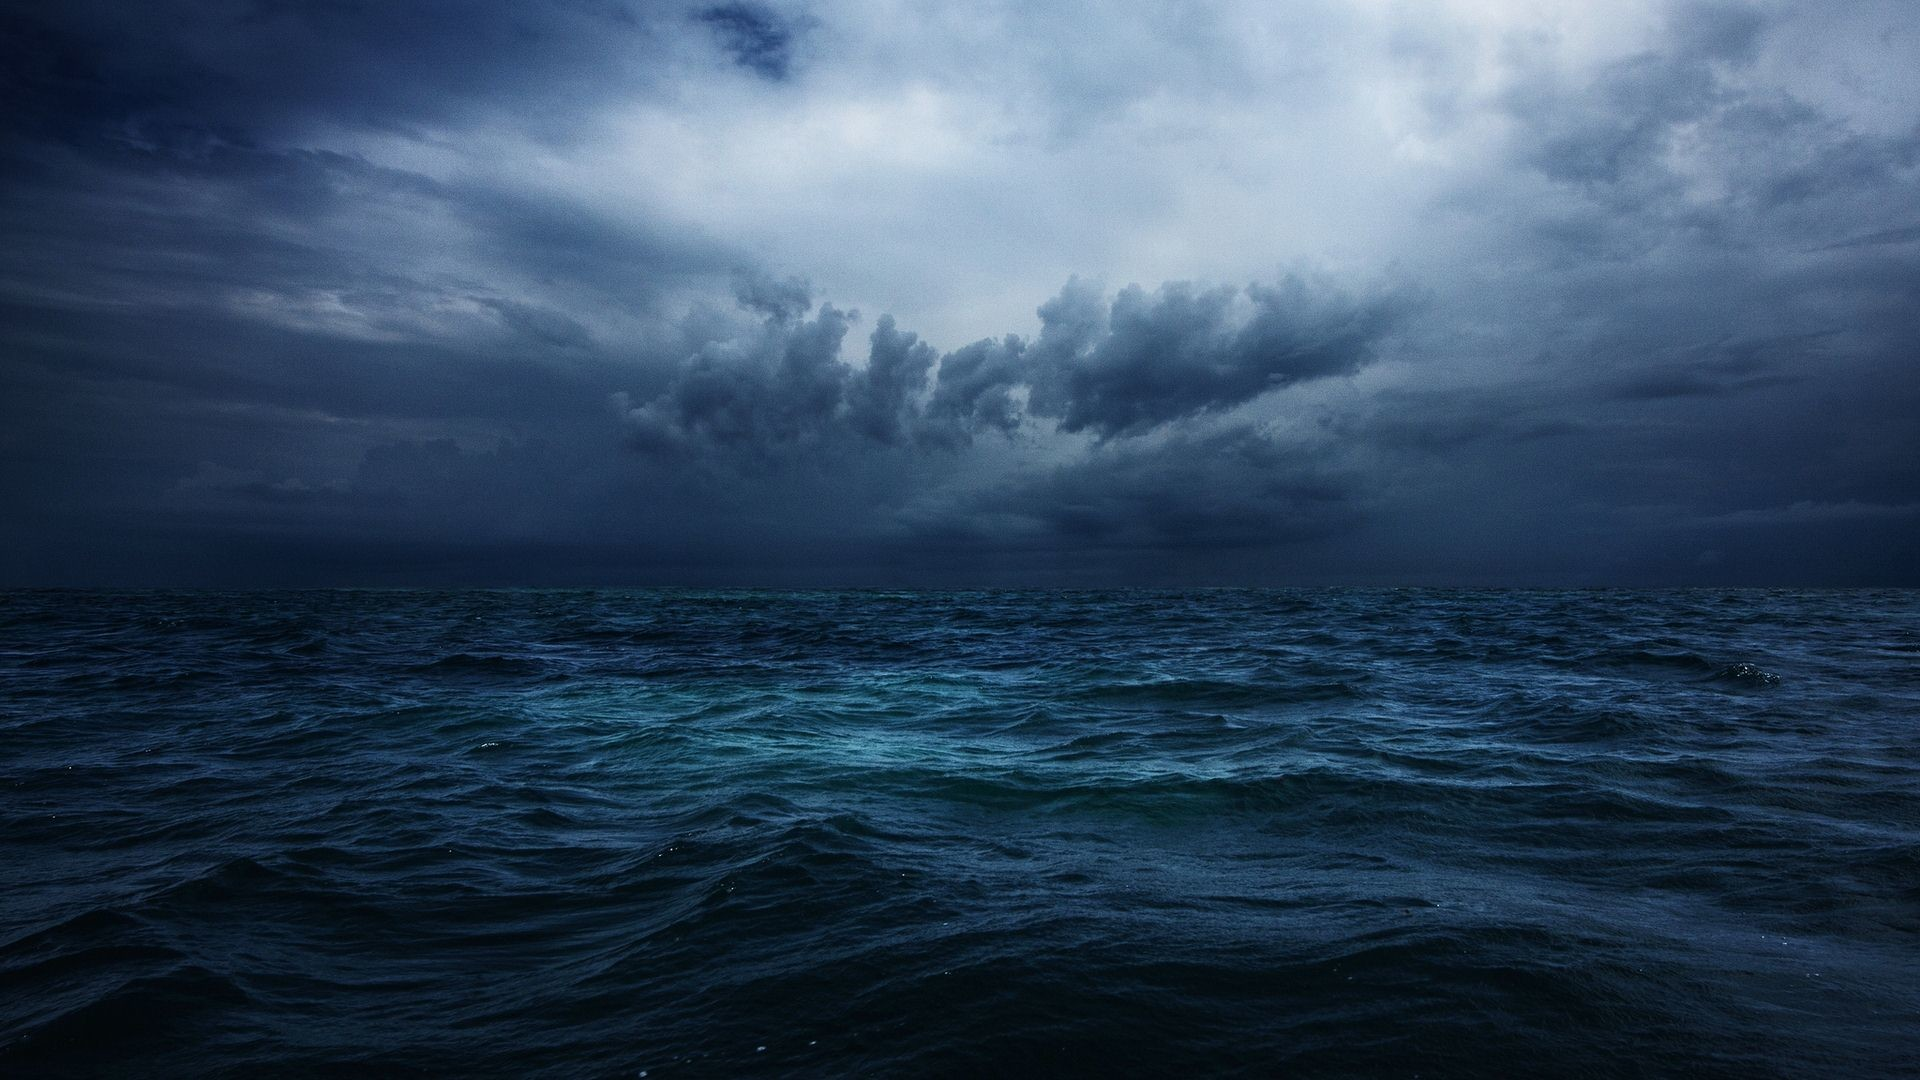 https://trunkweed.com/uploads/posts/images/847148-ocean-wallpaper-desktop-hd.jpg    Gloomy landscapes   Pinterest   Ocean wallpaper, Wallpaper and 3d …